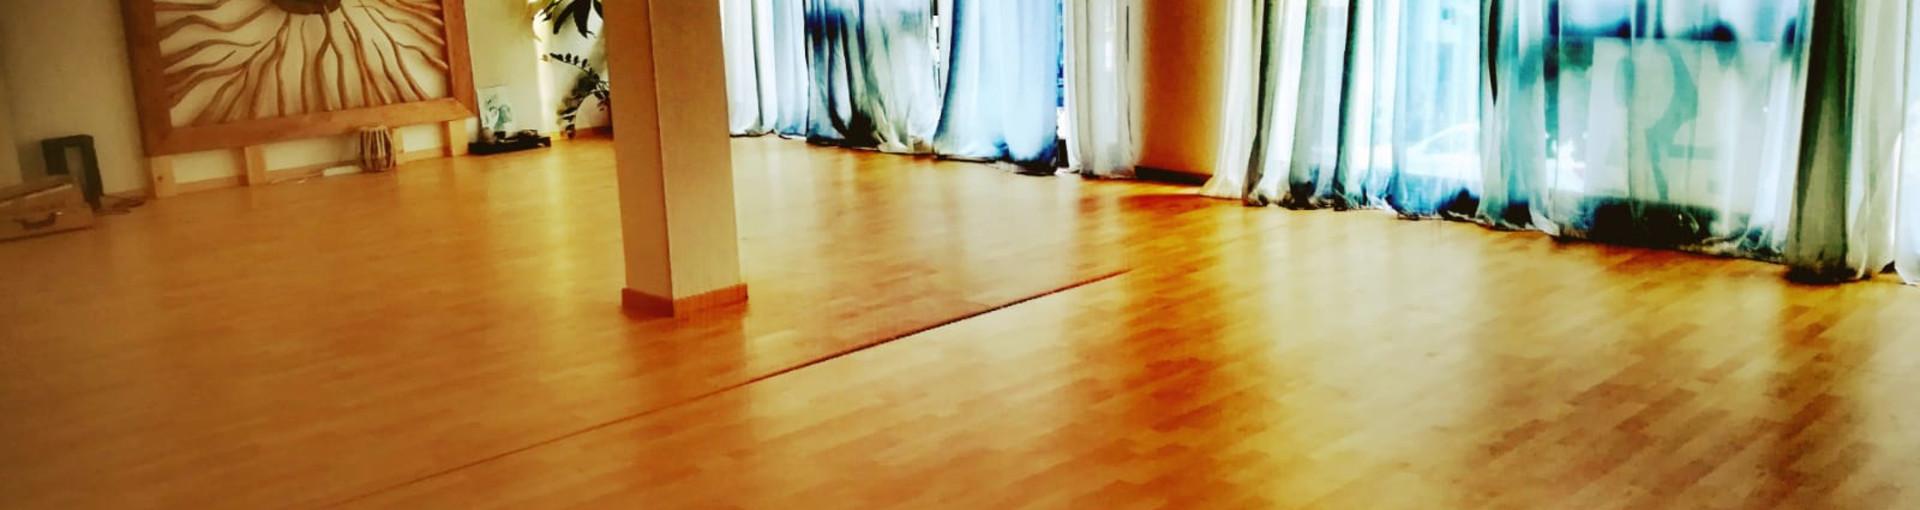 Centro Yoga Ram Dass Fiume - Viterbo